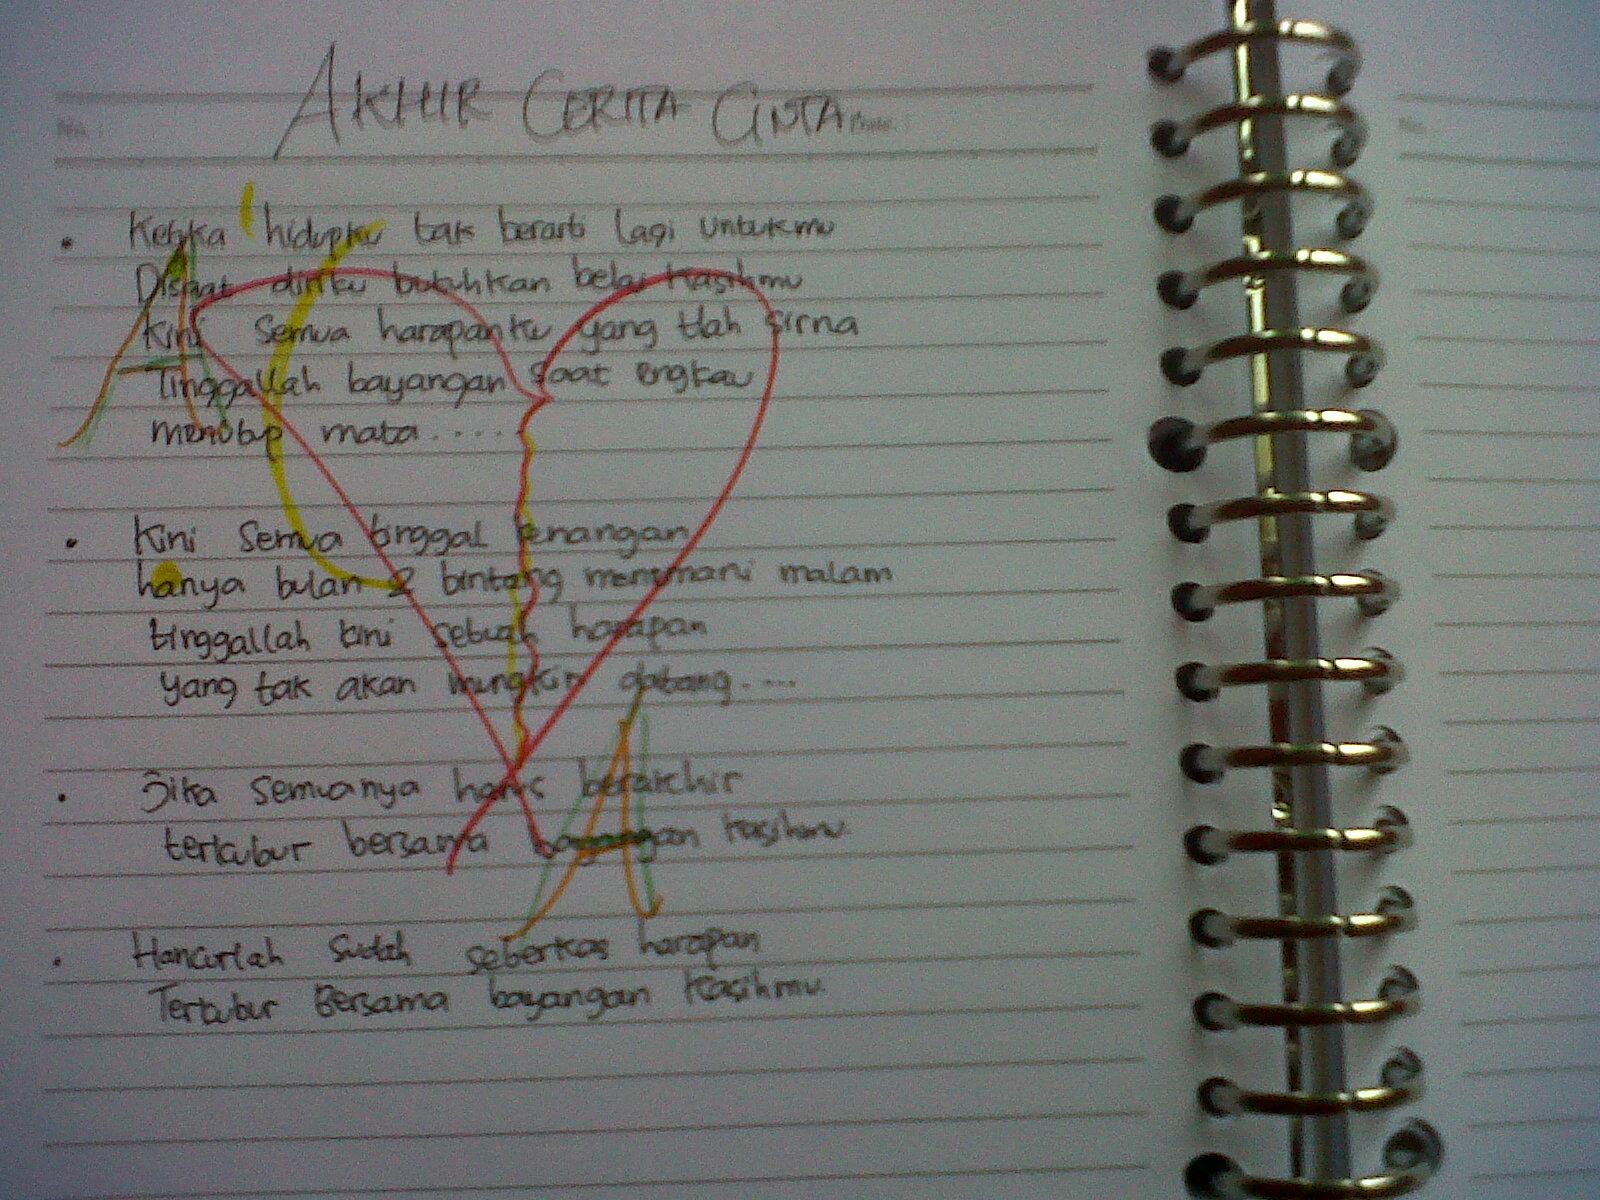 Image Result For Akhir Cerita Cinta Chords